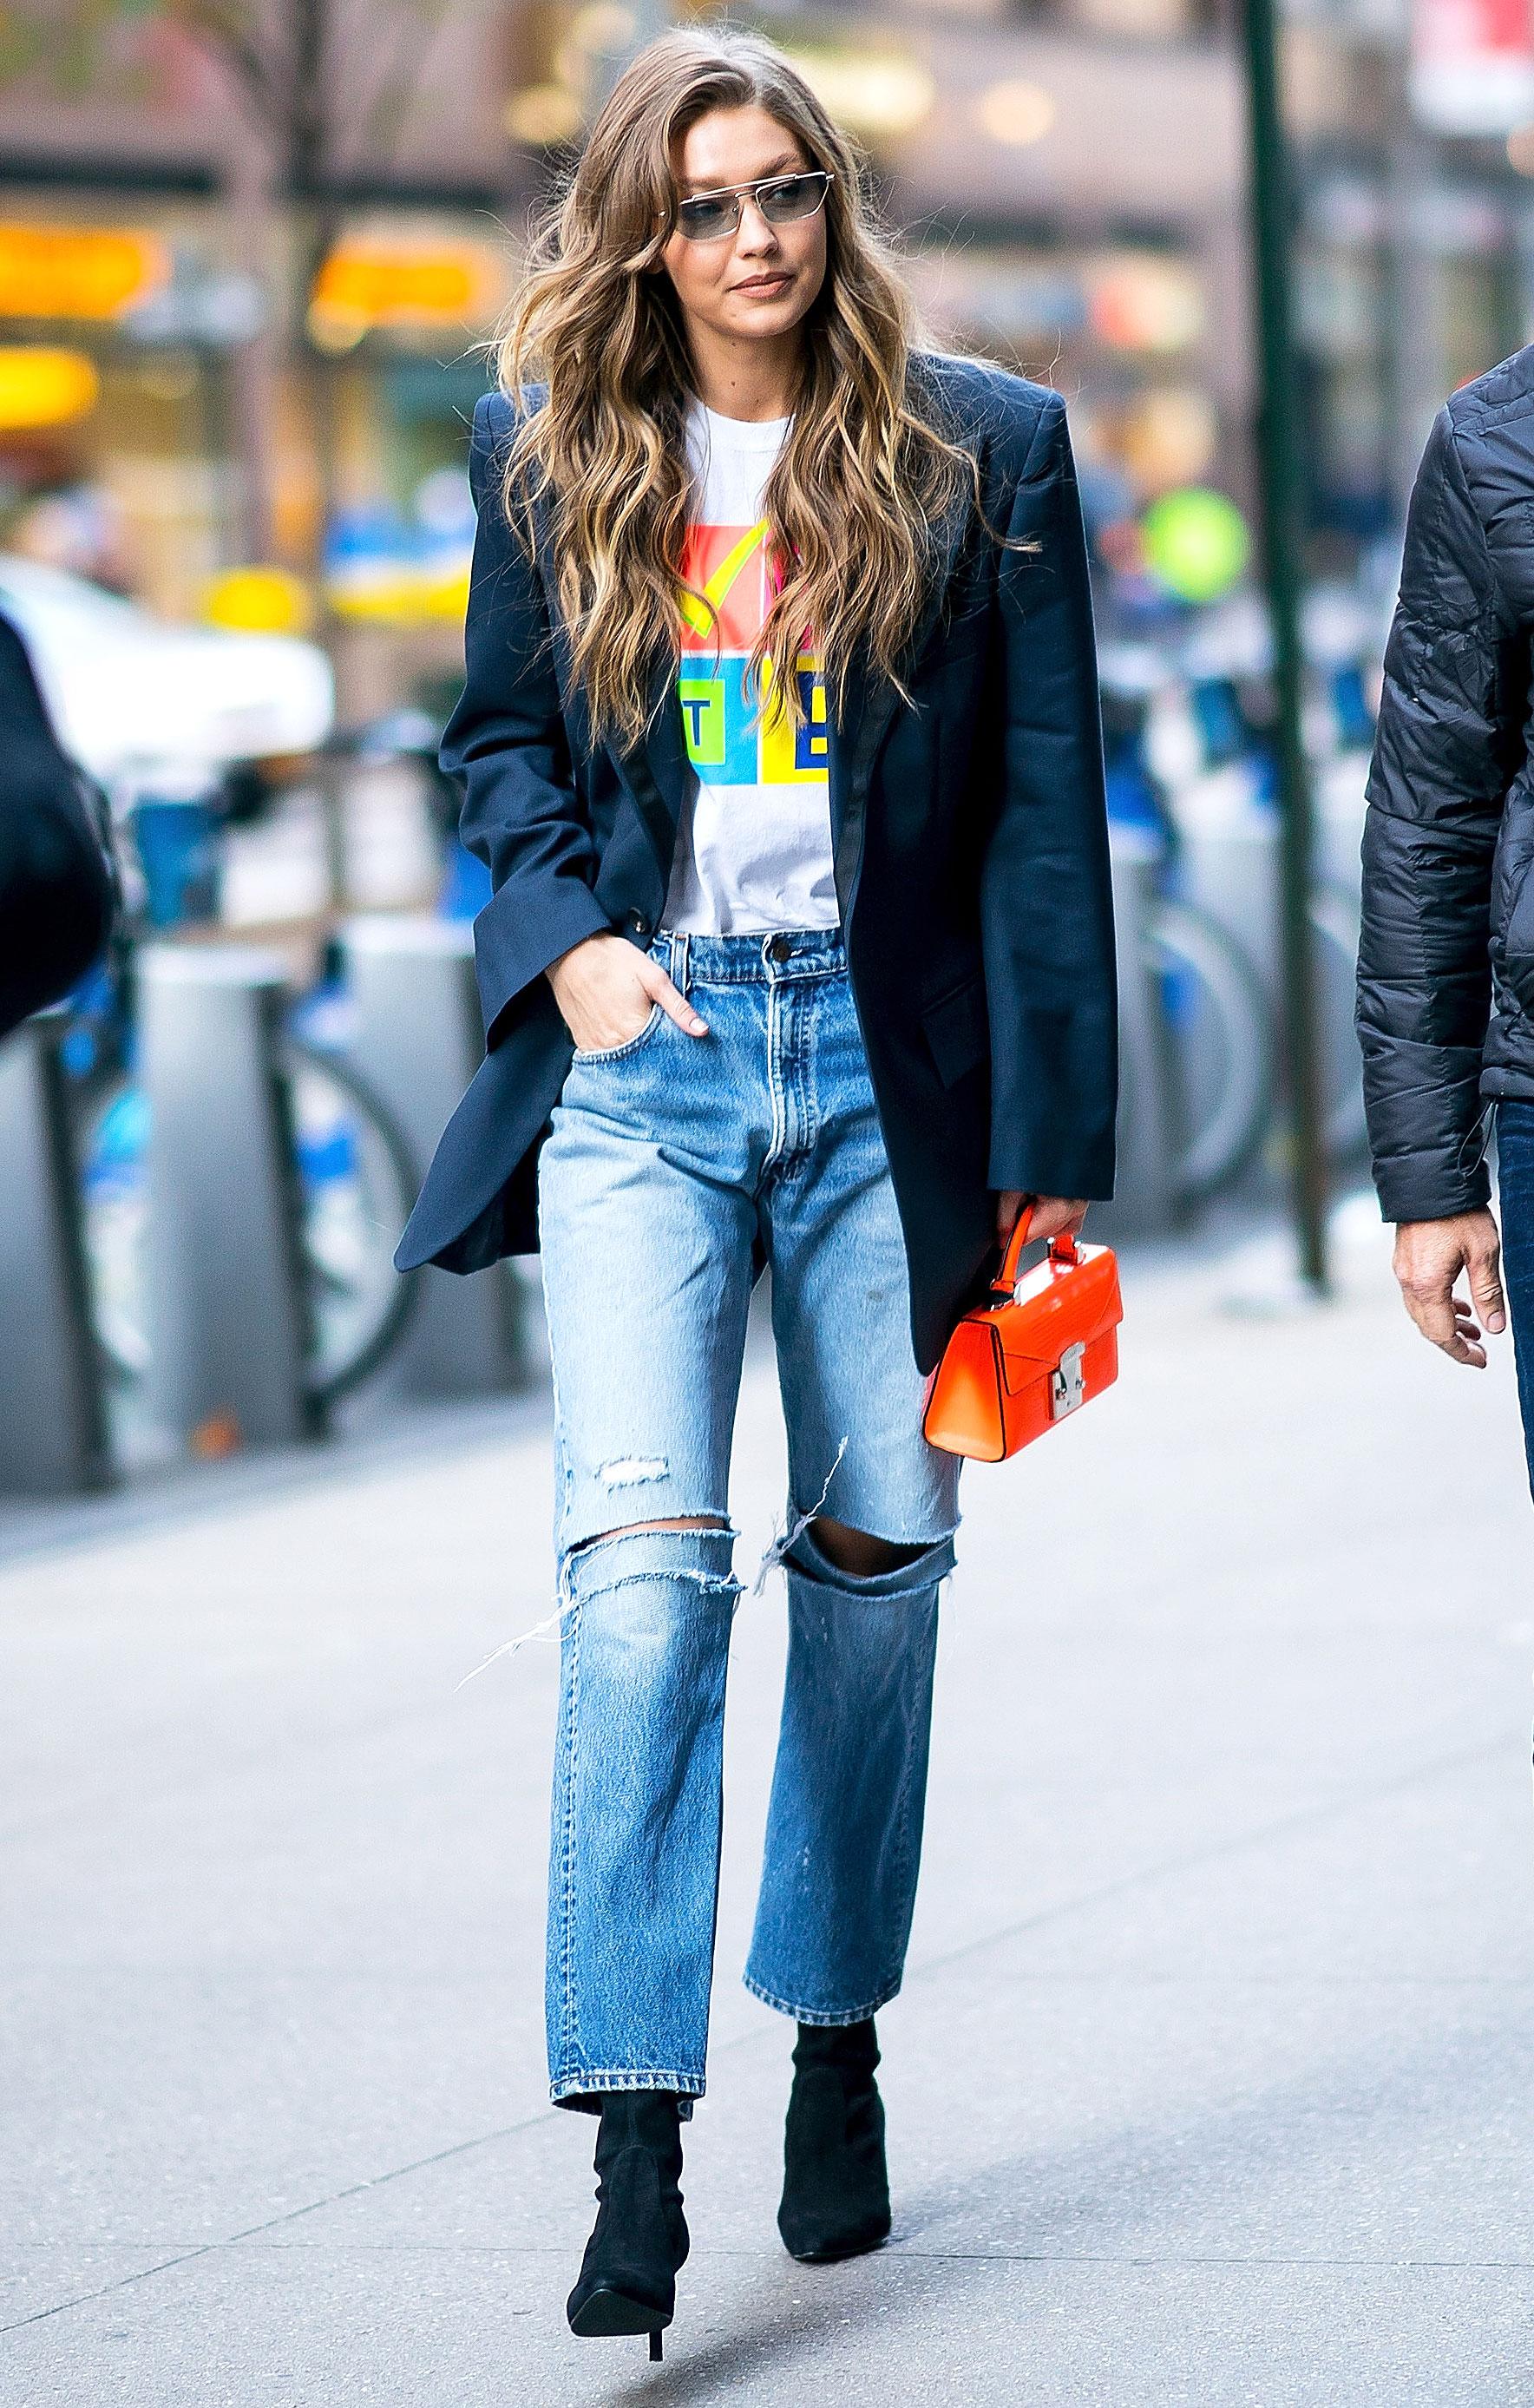 e685d0e553d4 Gigi Hadid's Best 2018 Street Style Fashion: Pics